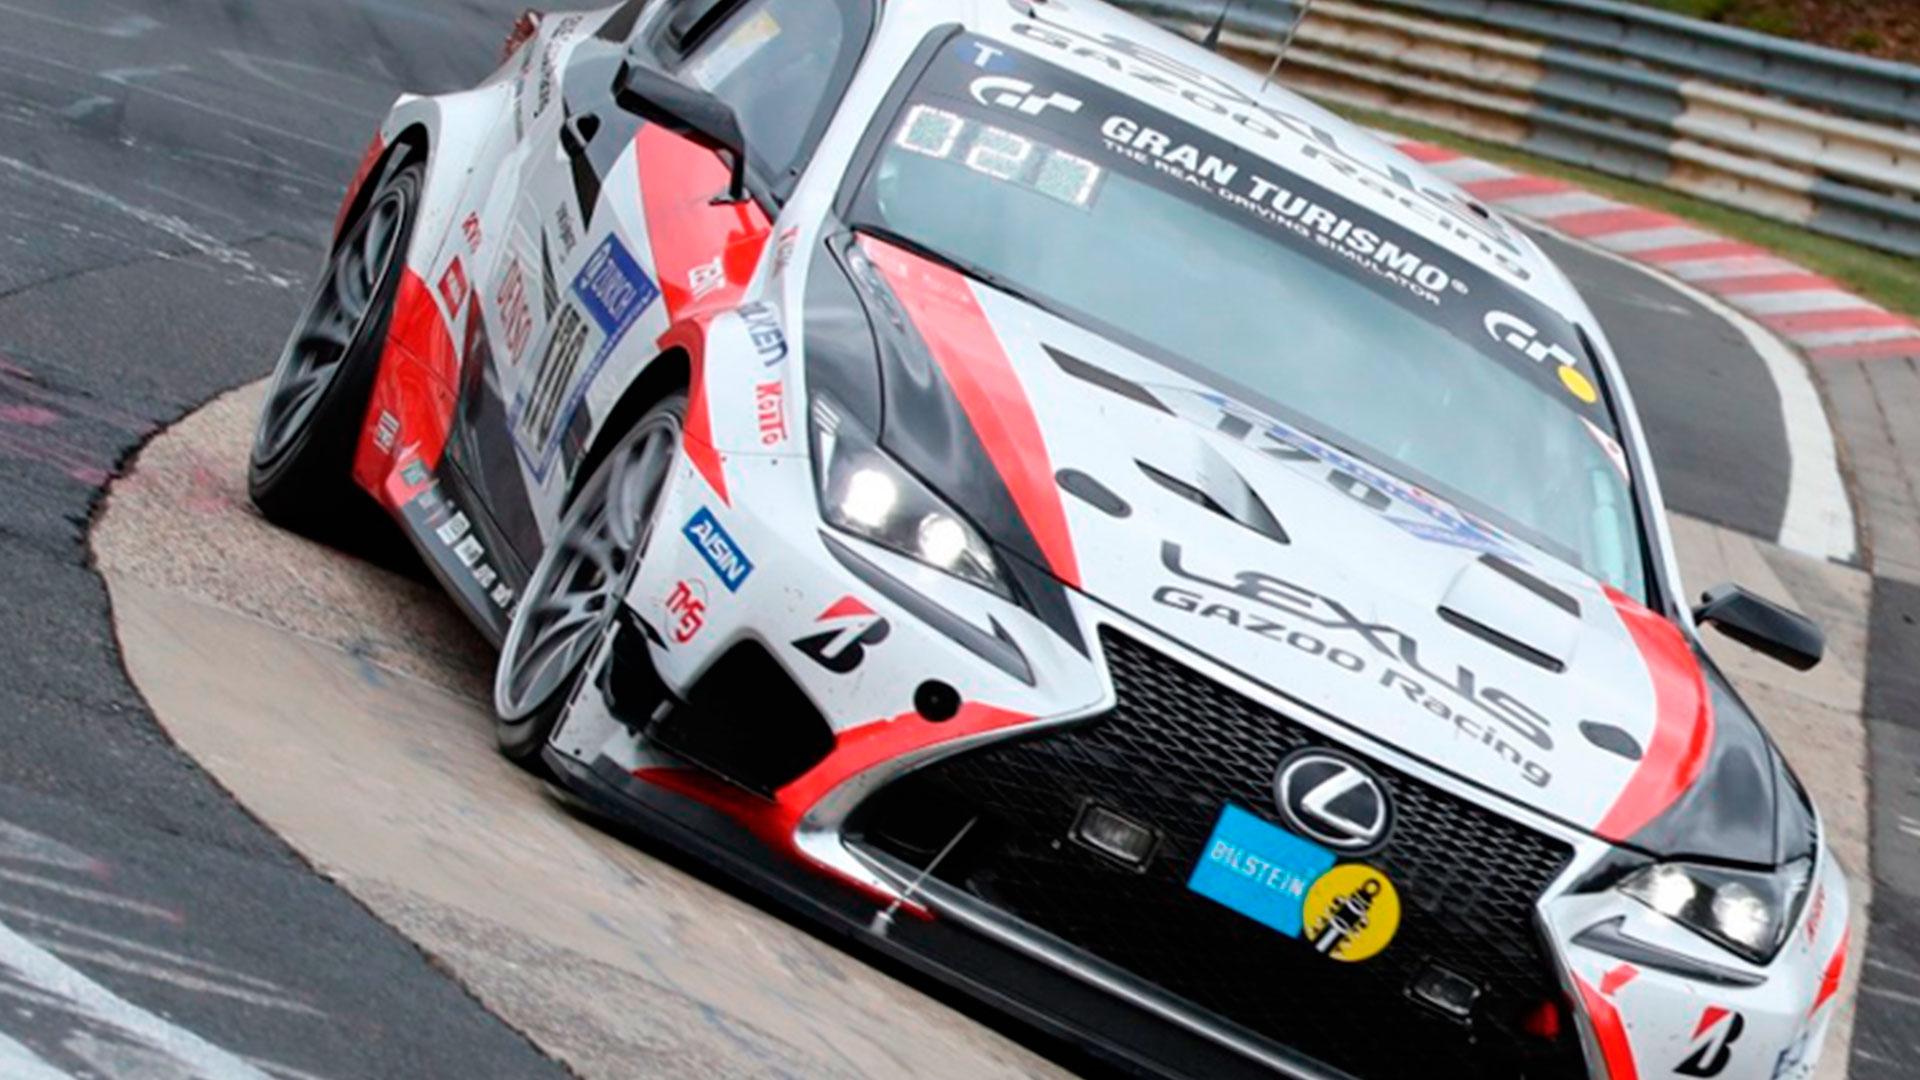 Lexus RC en la carrera de Nurburgring hero asset